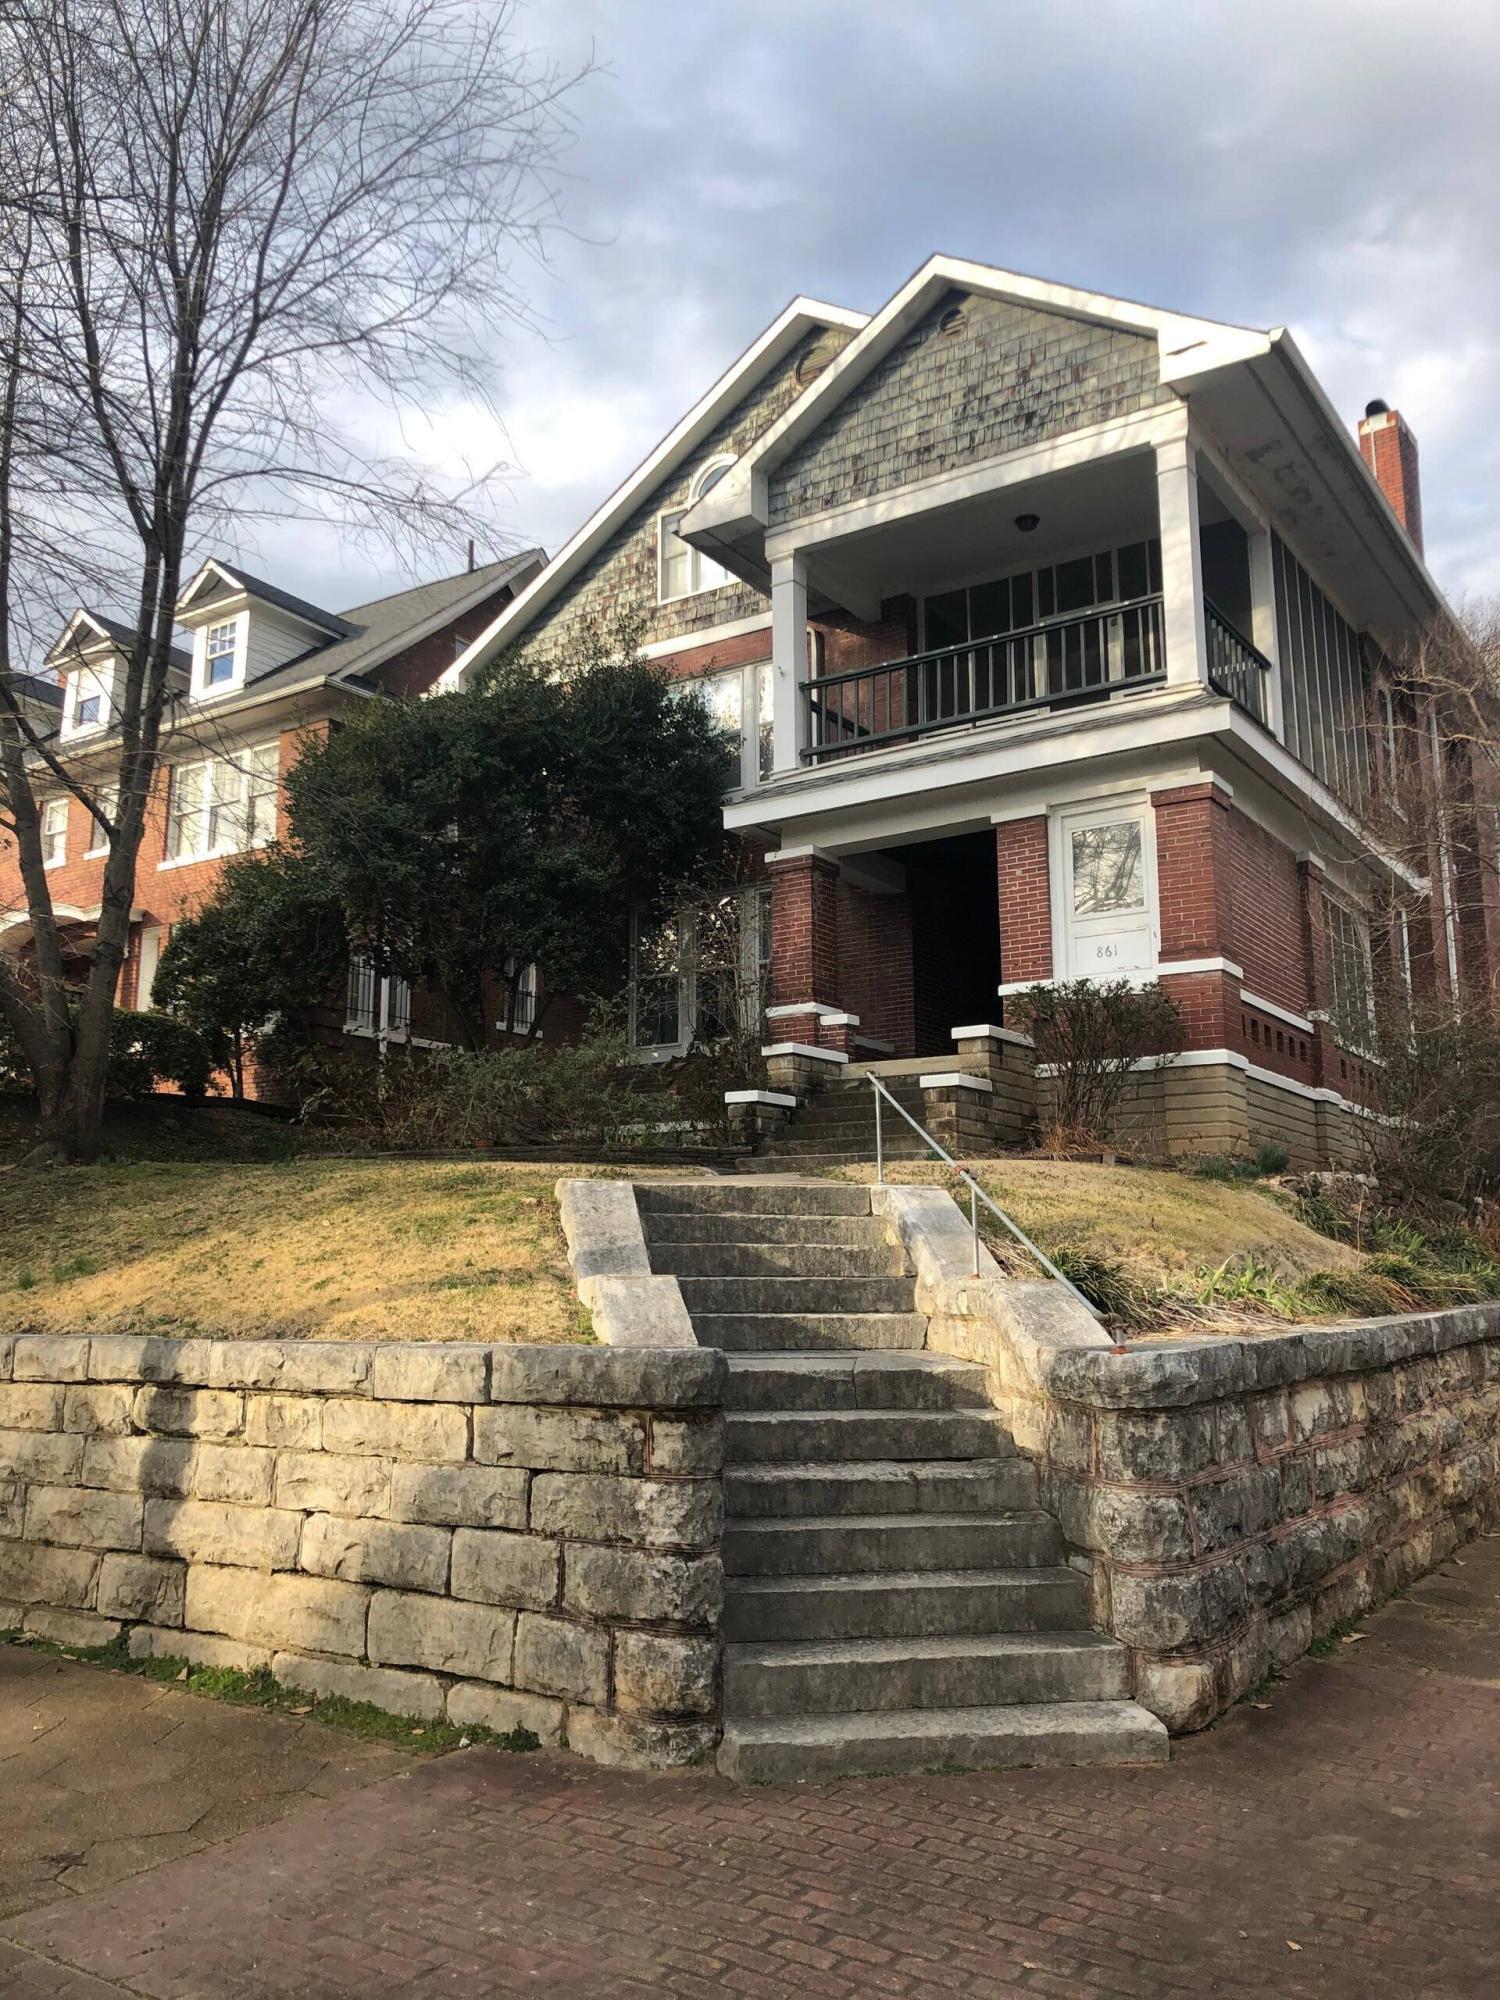 Details for 861 Vine, Chattanooga, TN 37403